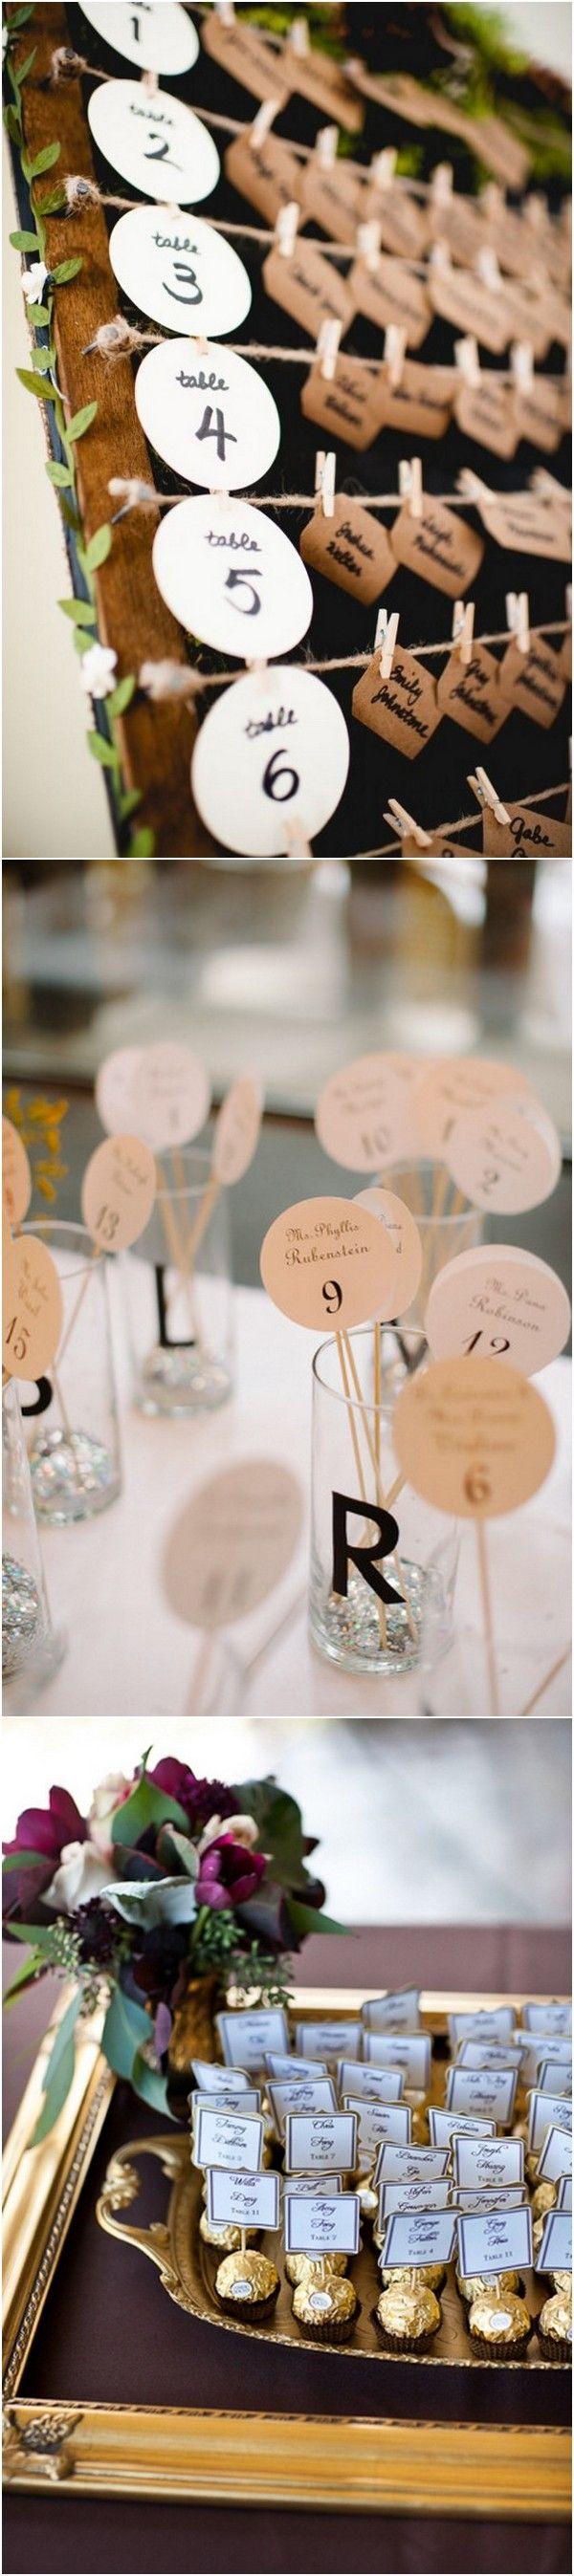 Creative Wedding Escort Card Display Ideas to Love Card